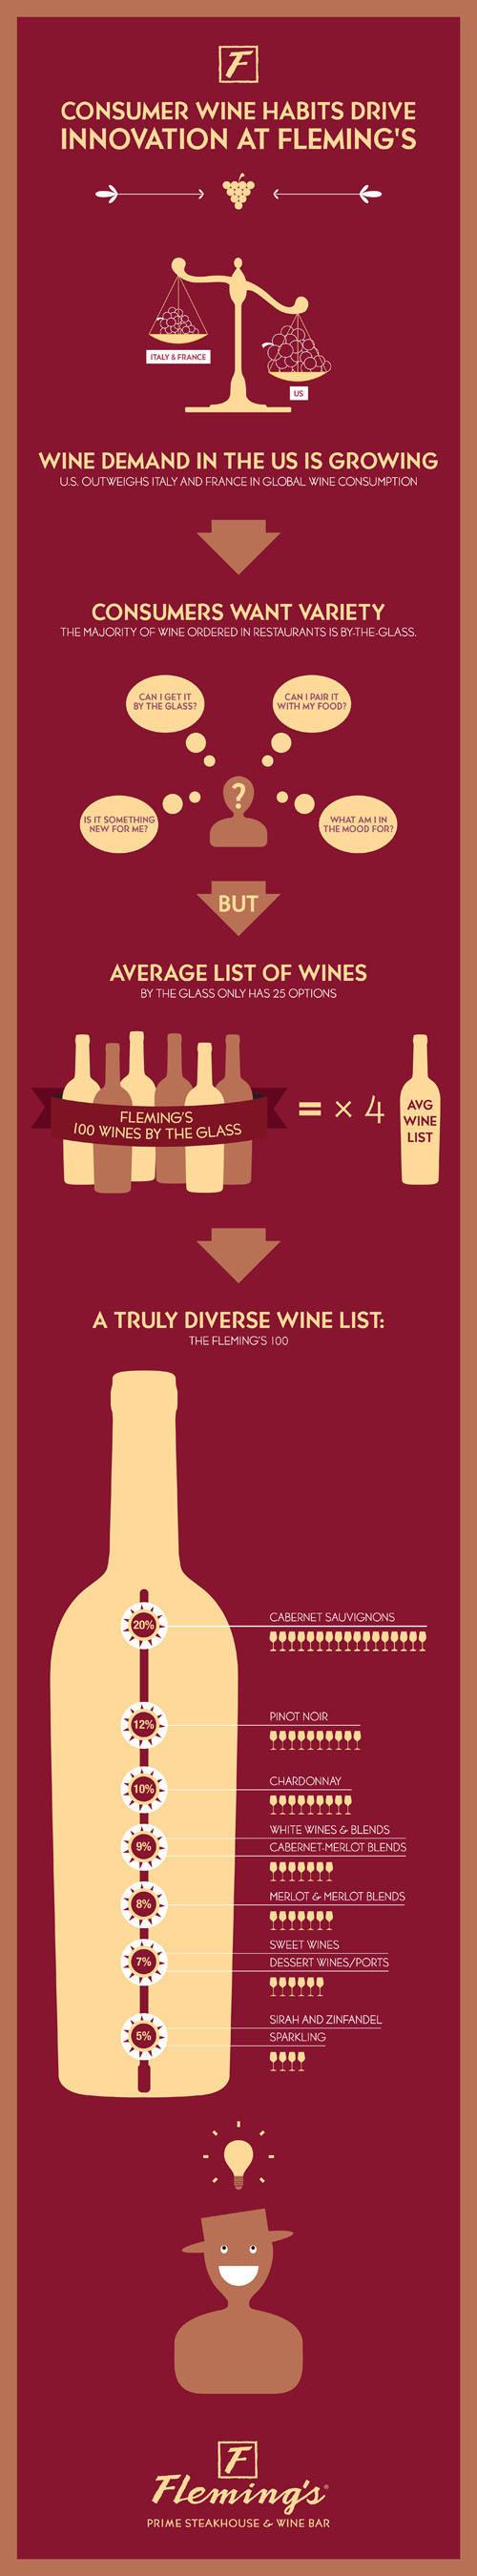 Consumer Wine Demand Drives Restaurant Innovation